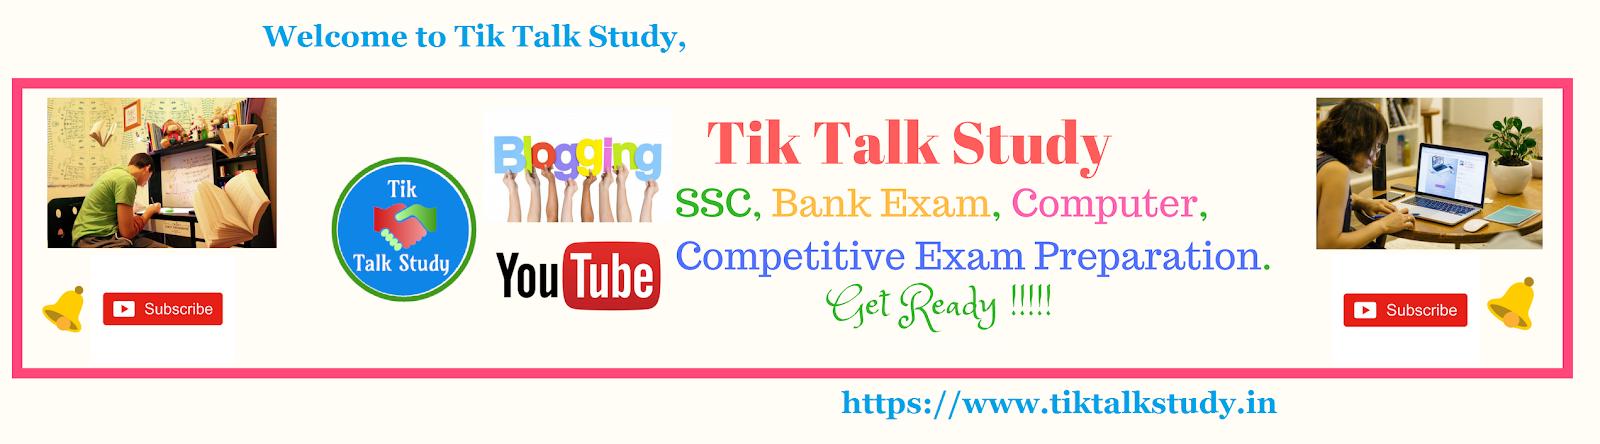 About the Tik Talk Study